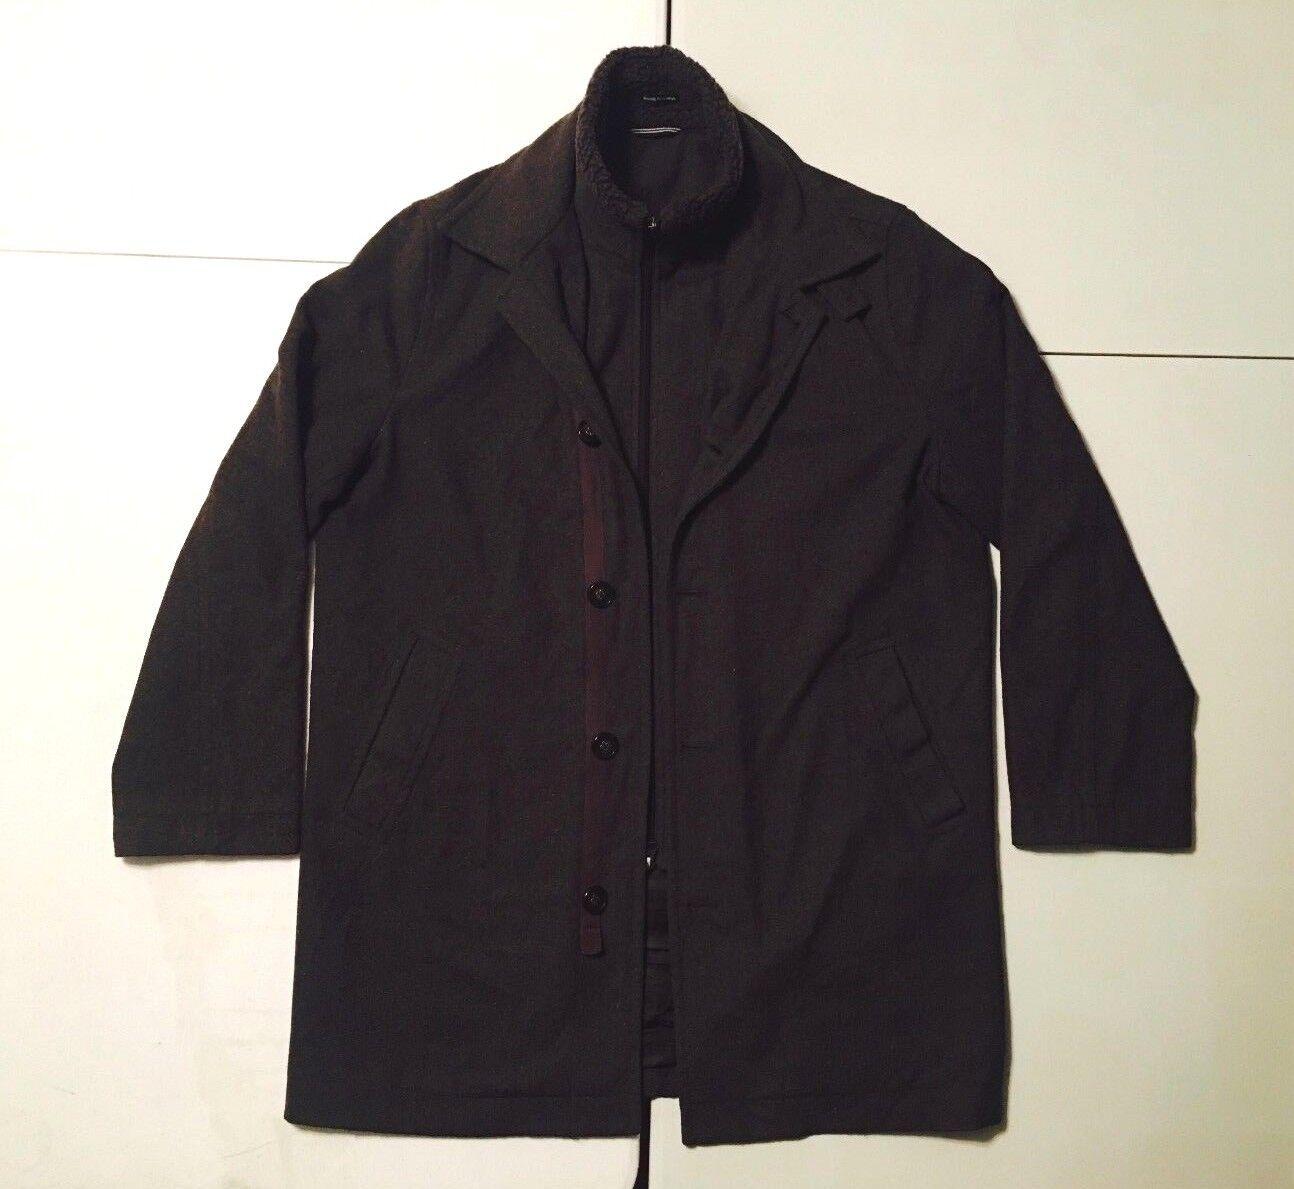 Nautica Men's PG Knit Collar Insert Wool Blend Coat, Brown 40R Regular